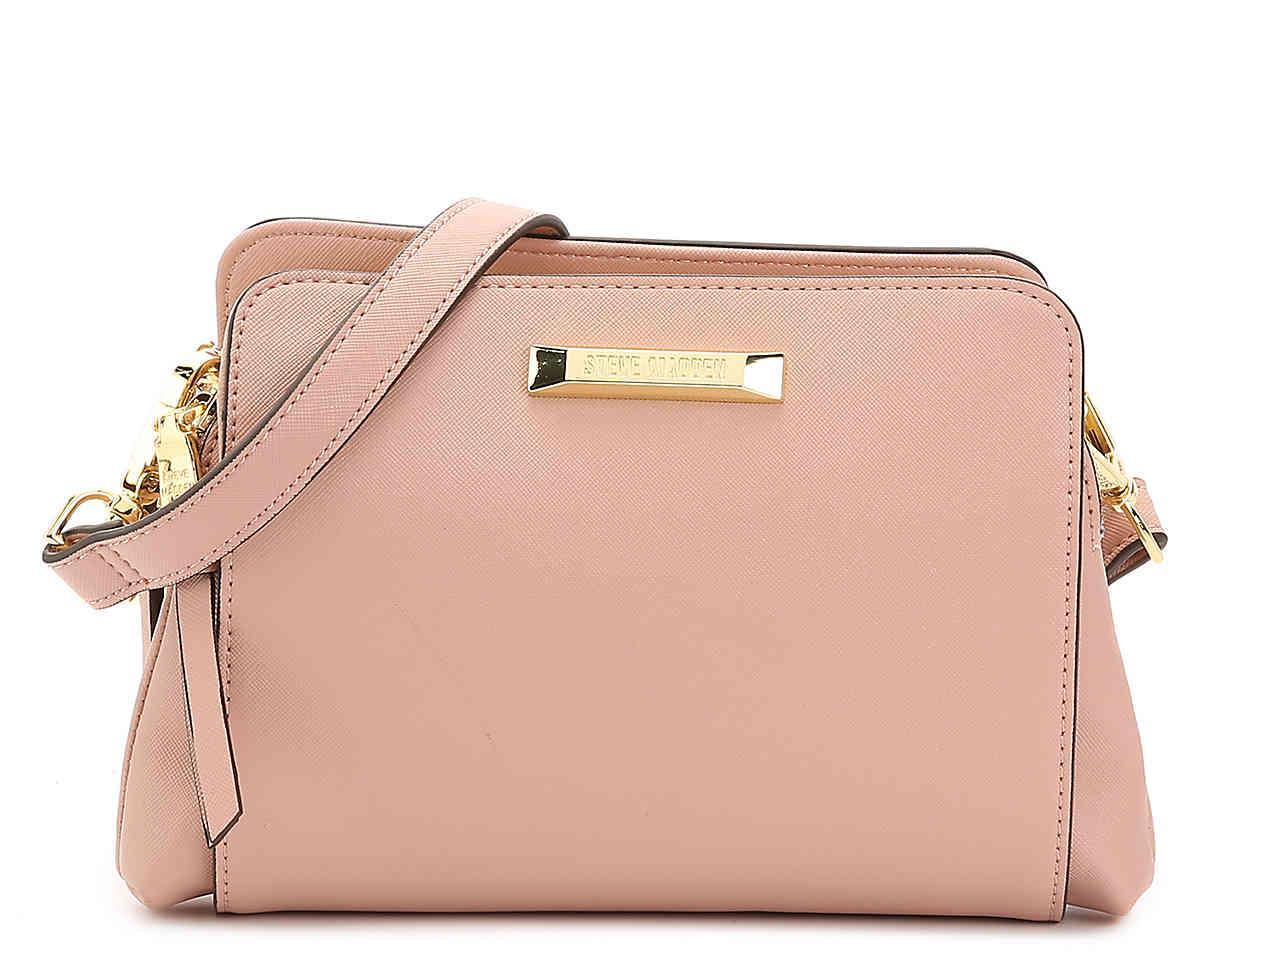 bc3a45f01f8 Steve Madden Blannis Crossbody Bag in Pink - Lyst